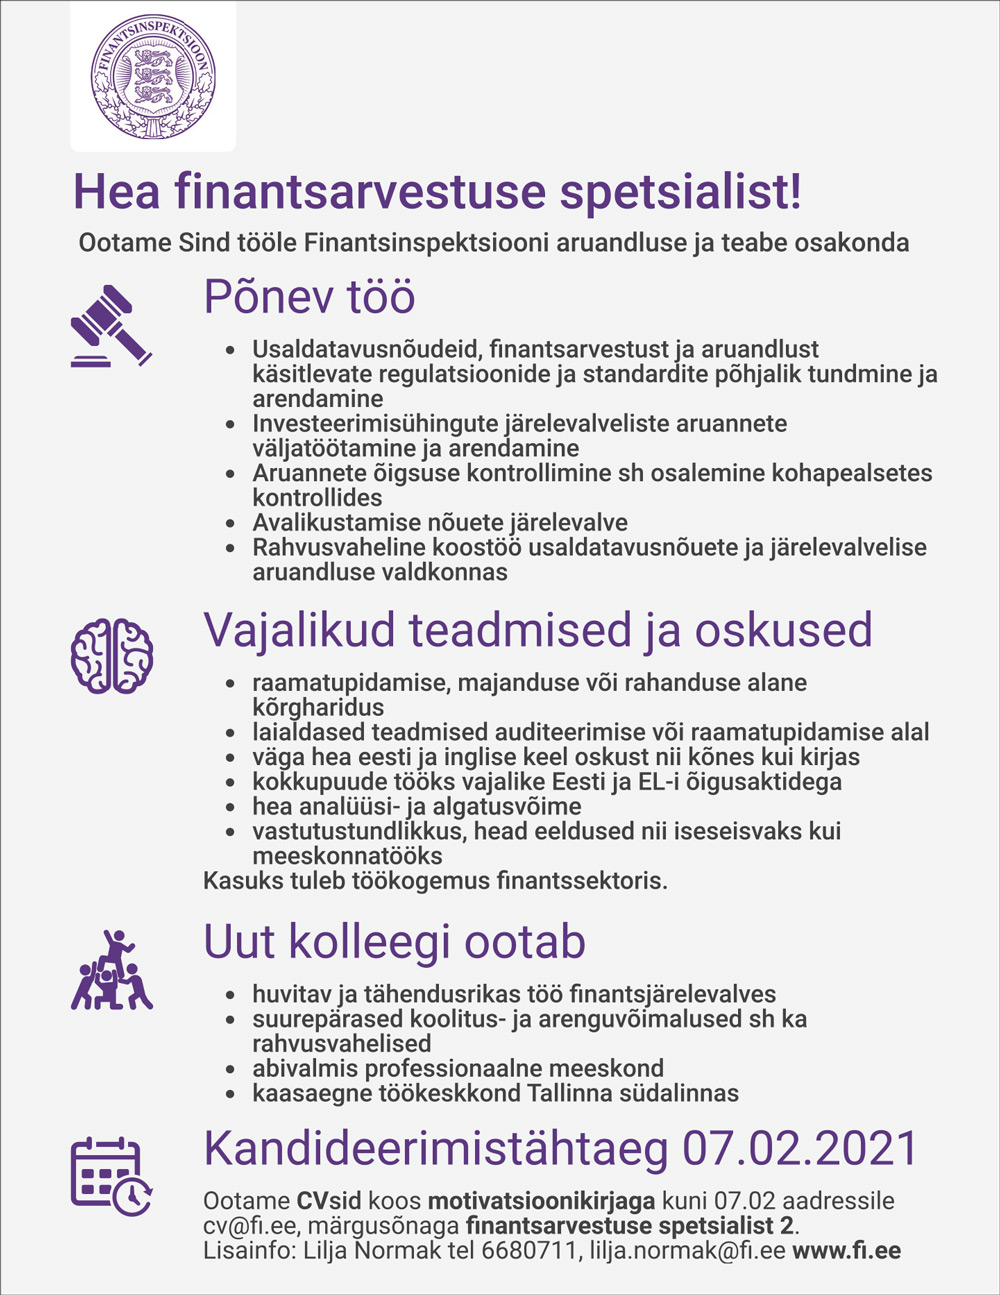 FINANTSARVESTUSE SPETSIALIST